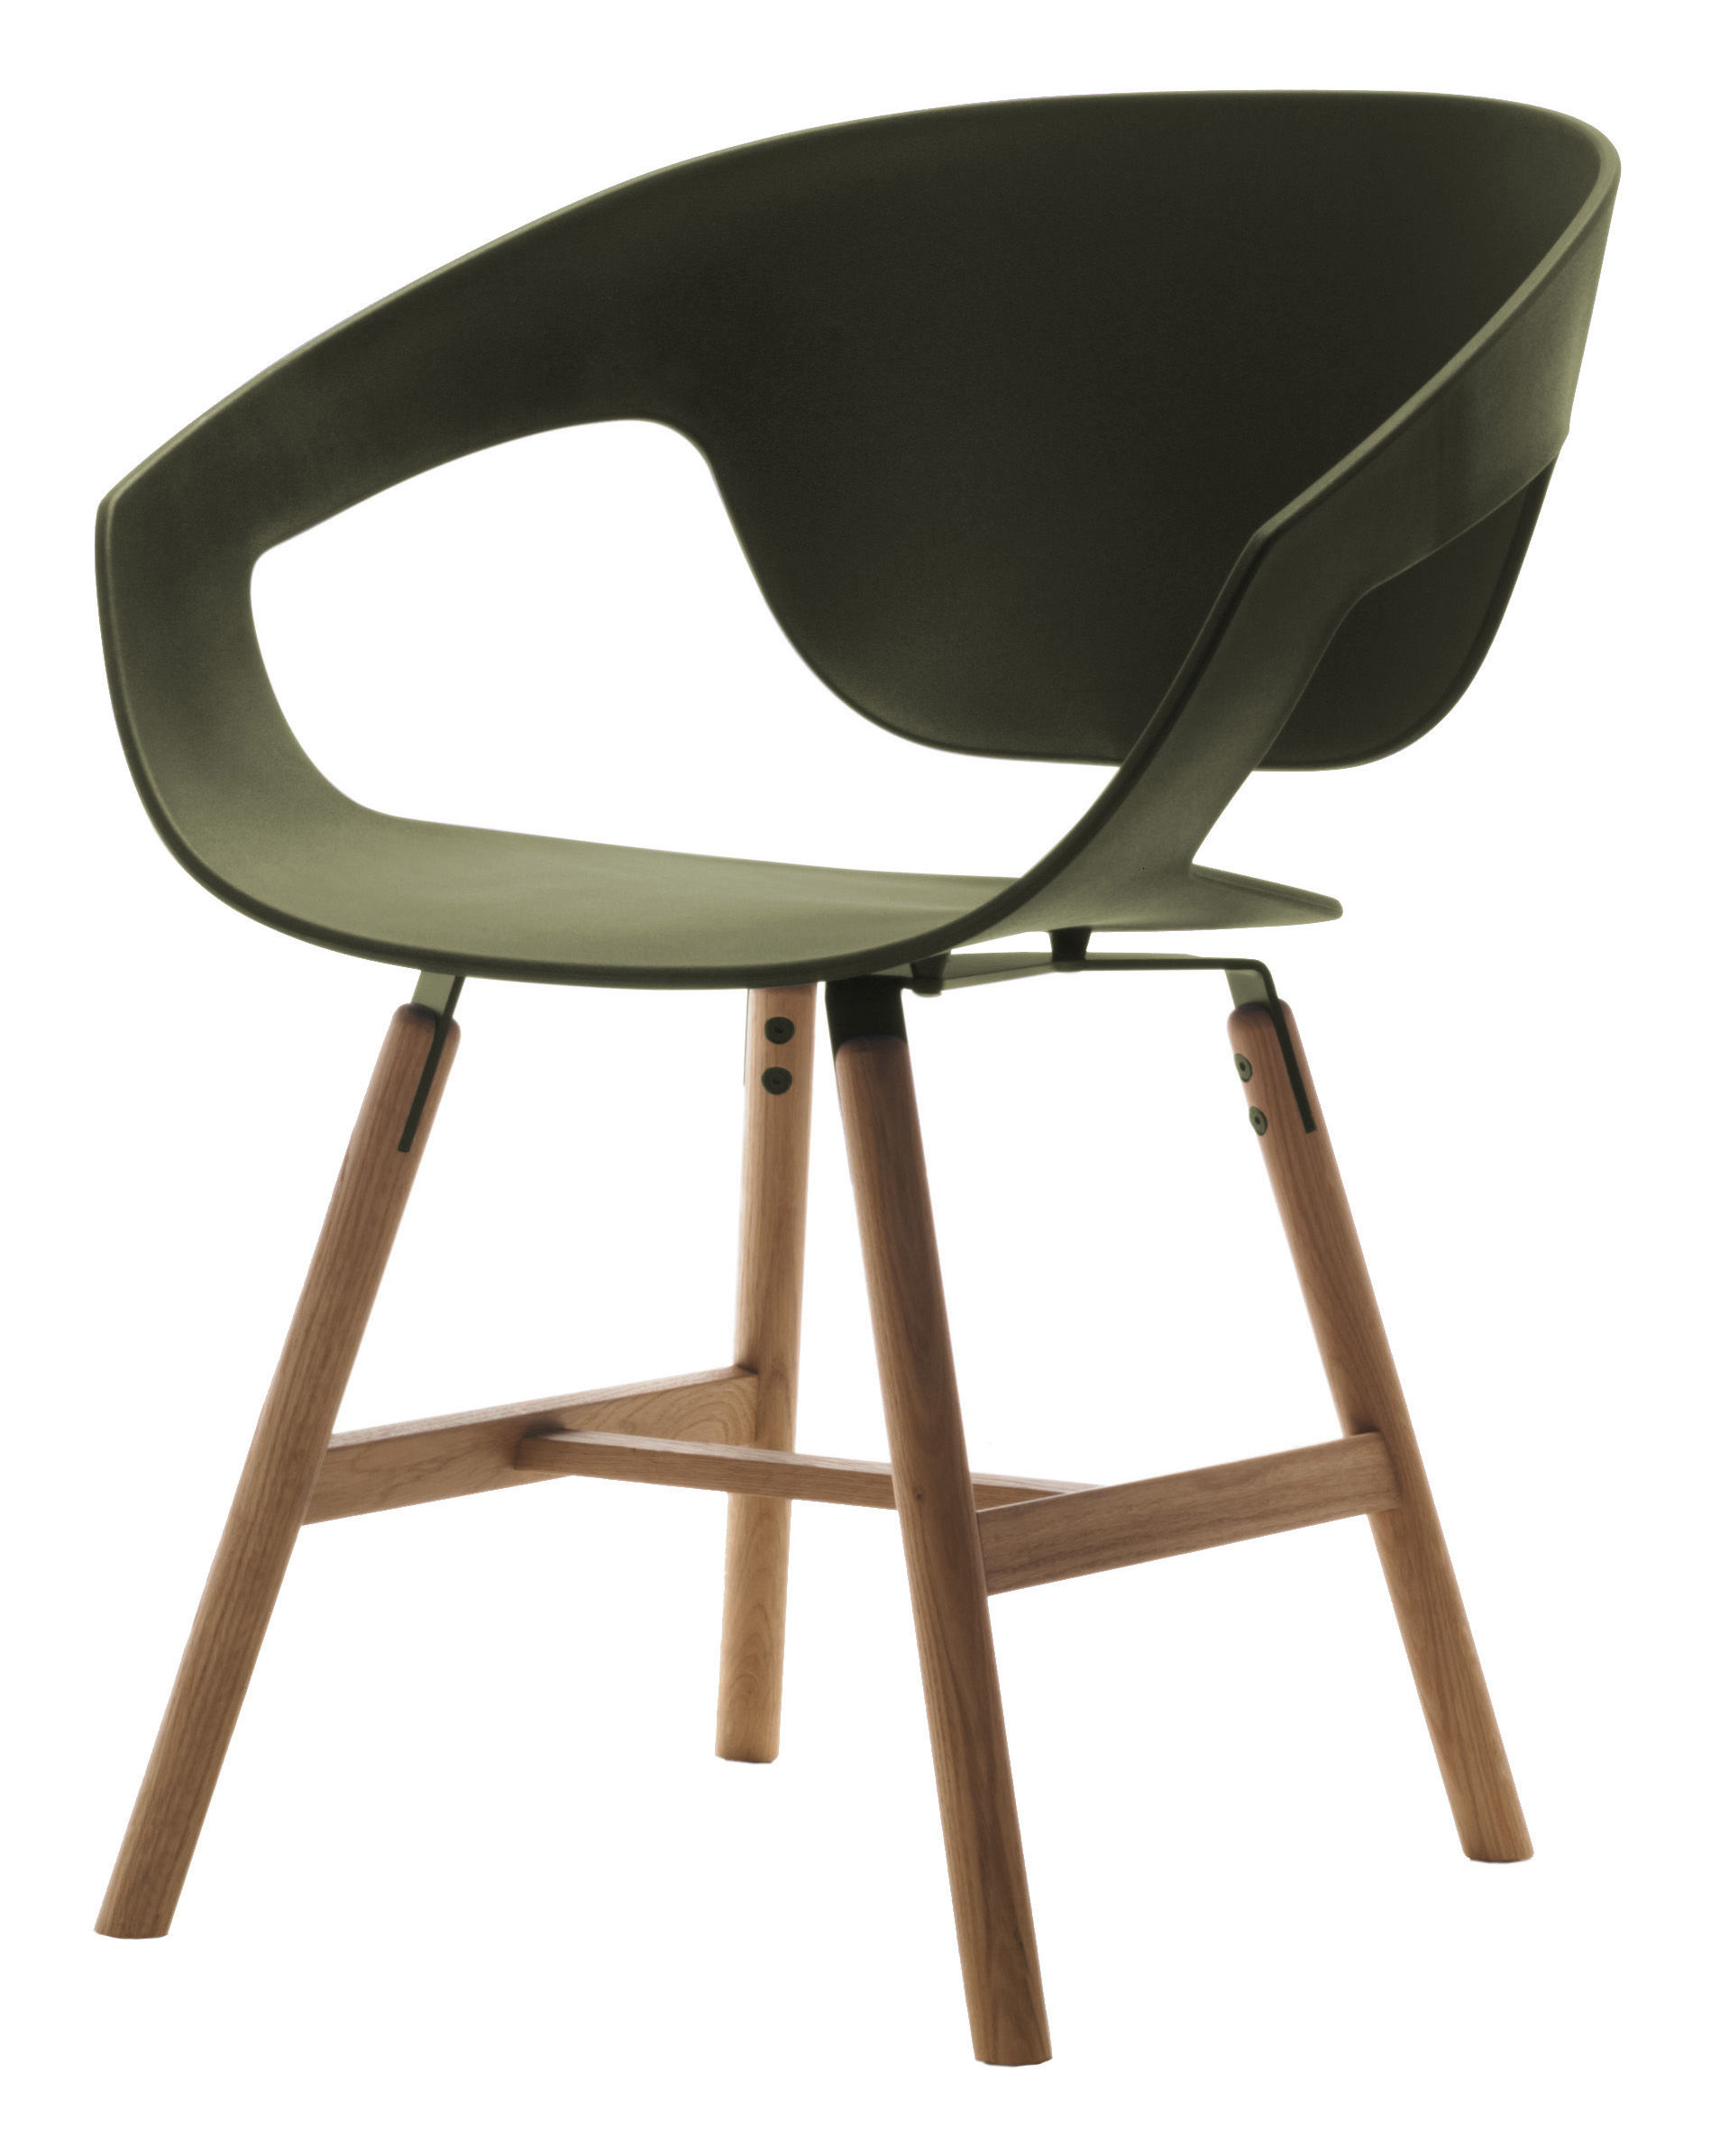 Möbel - Stühle  - Vad wood Sessel - Casamania - Grün - Massivholz, Polypropylen